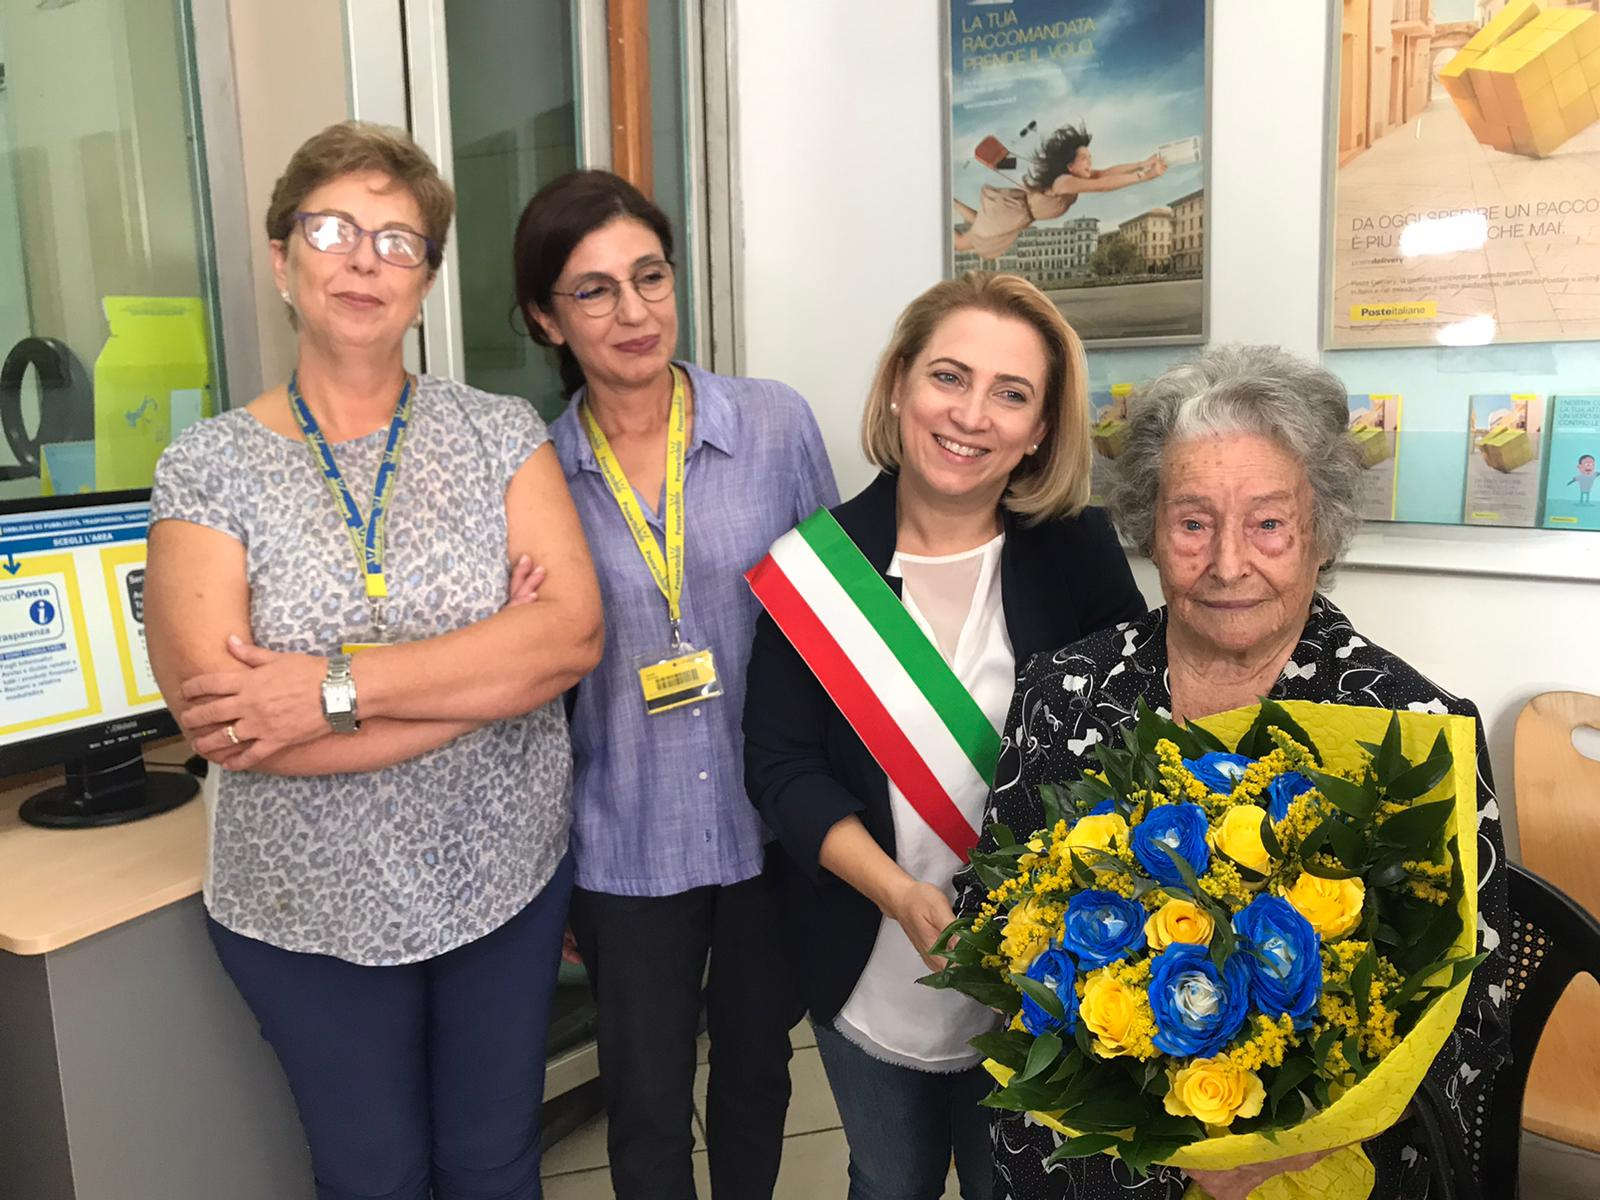 CENTENARIA POSTE ITALIANE CAULONIA RADIO GIOIOSA MARINA NEWS